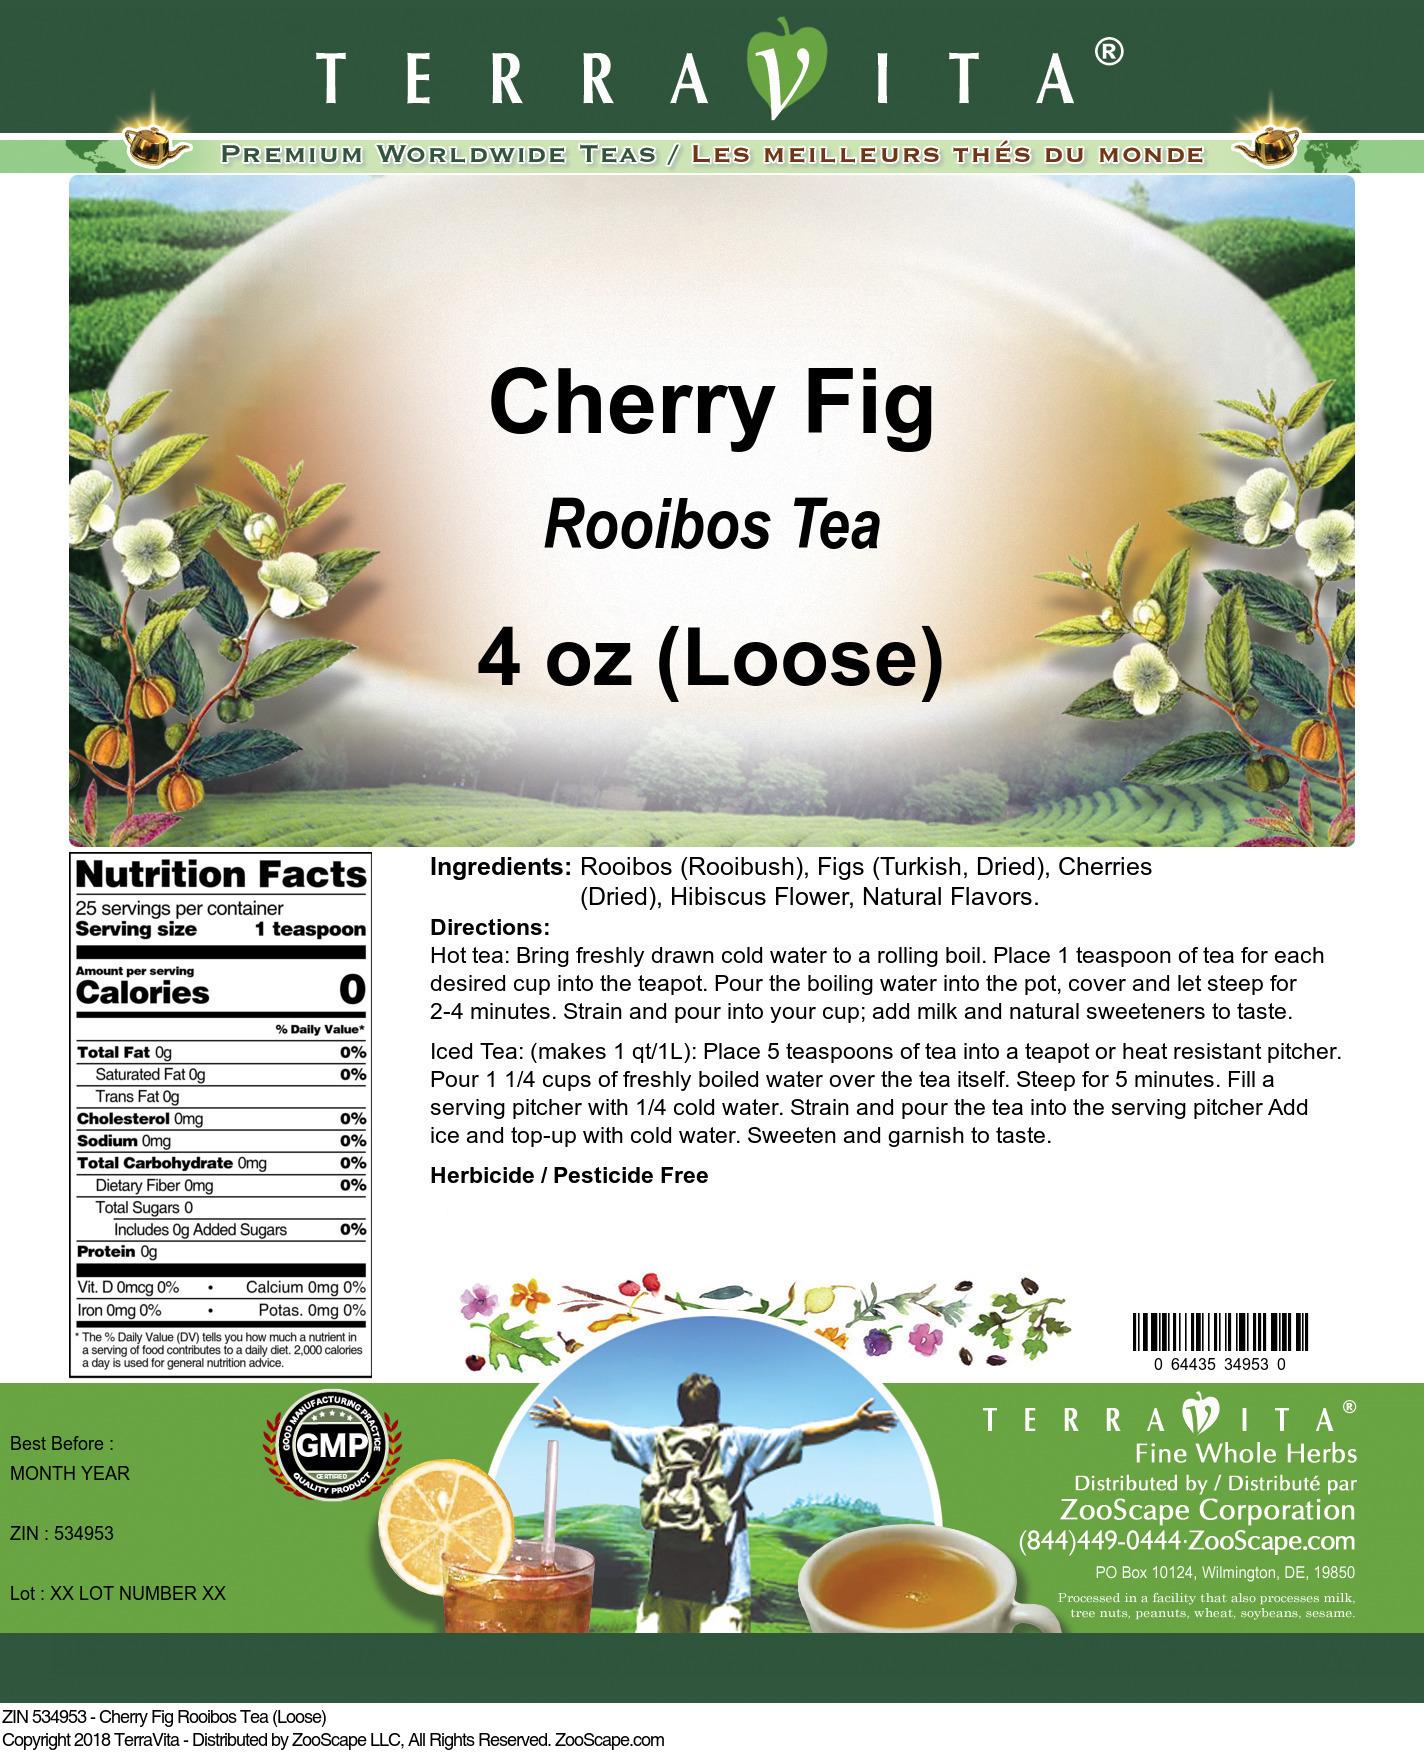 Cherry Fig Rooibos Tea (Loose)